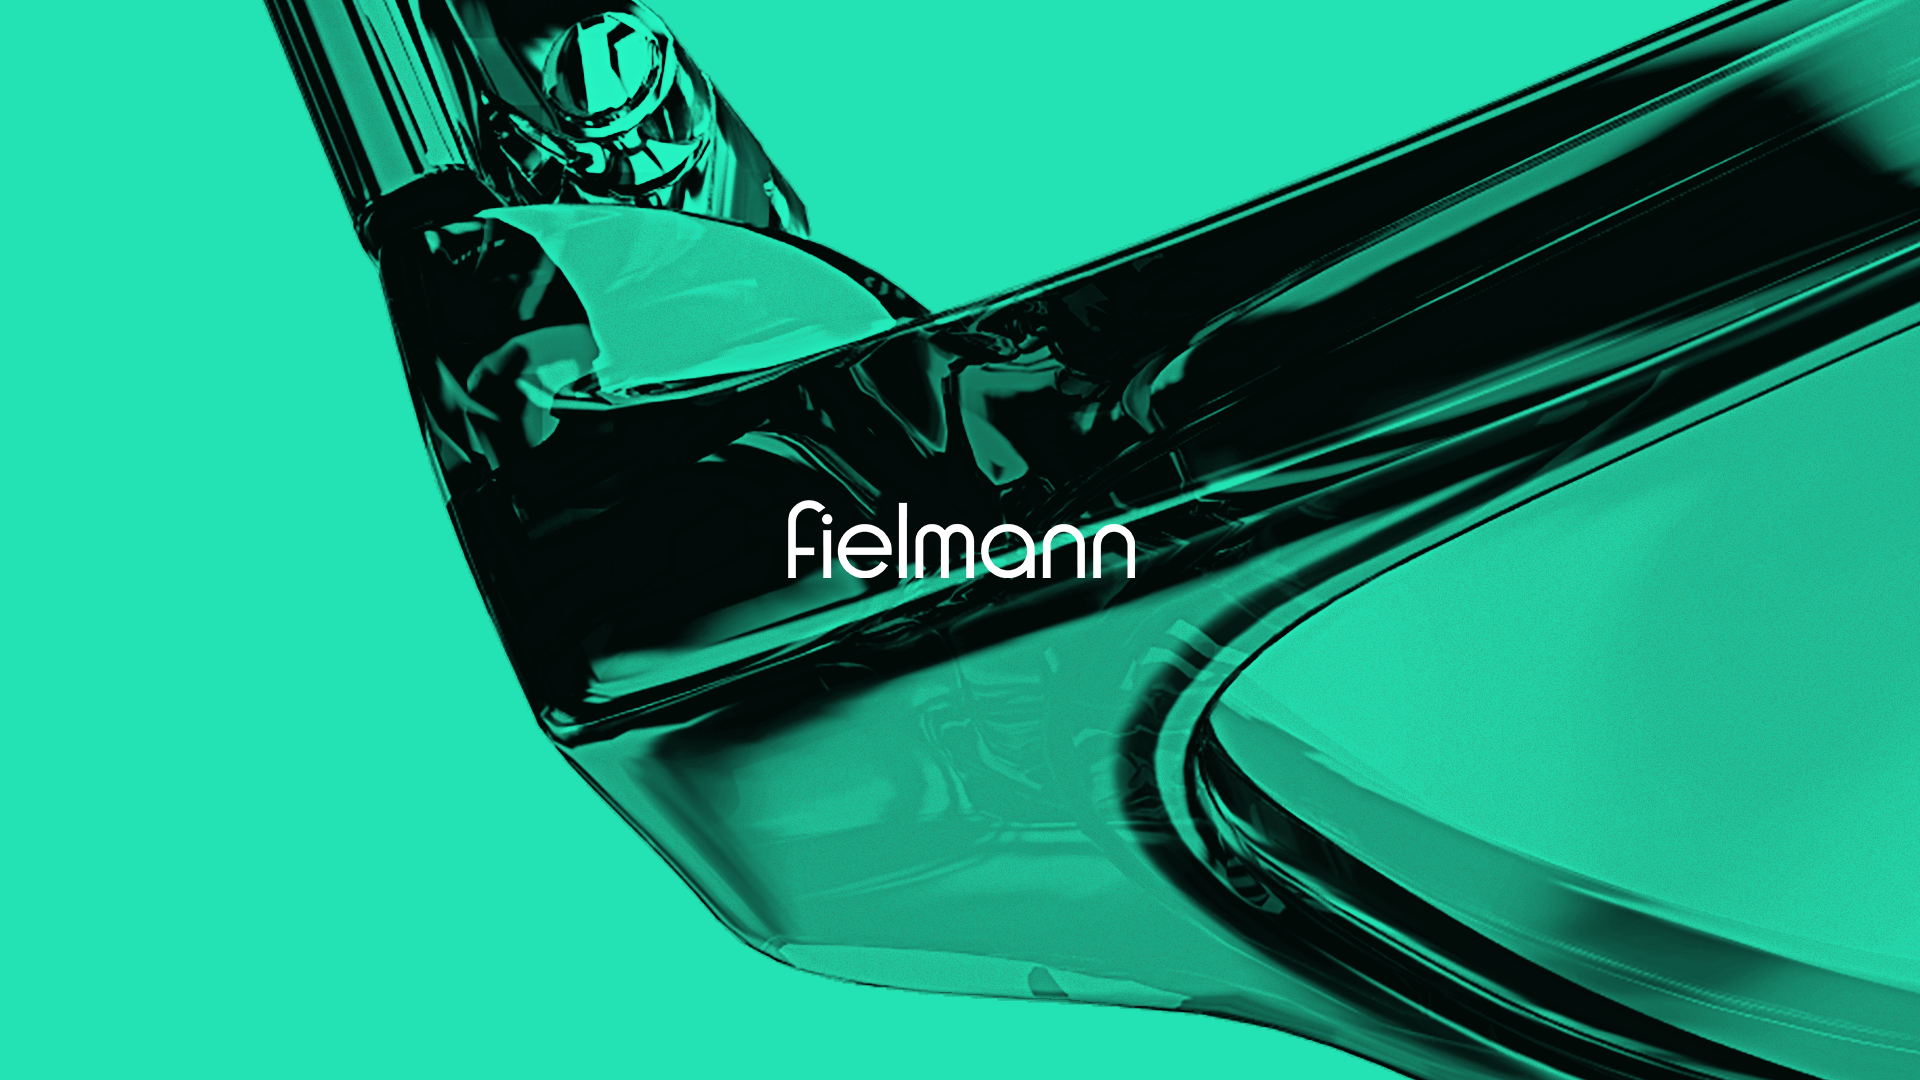 Fielmann Design System